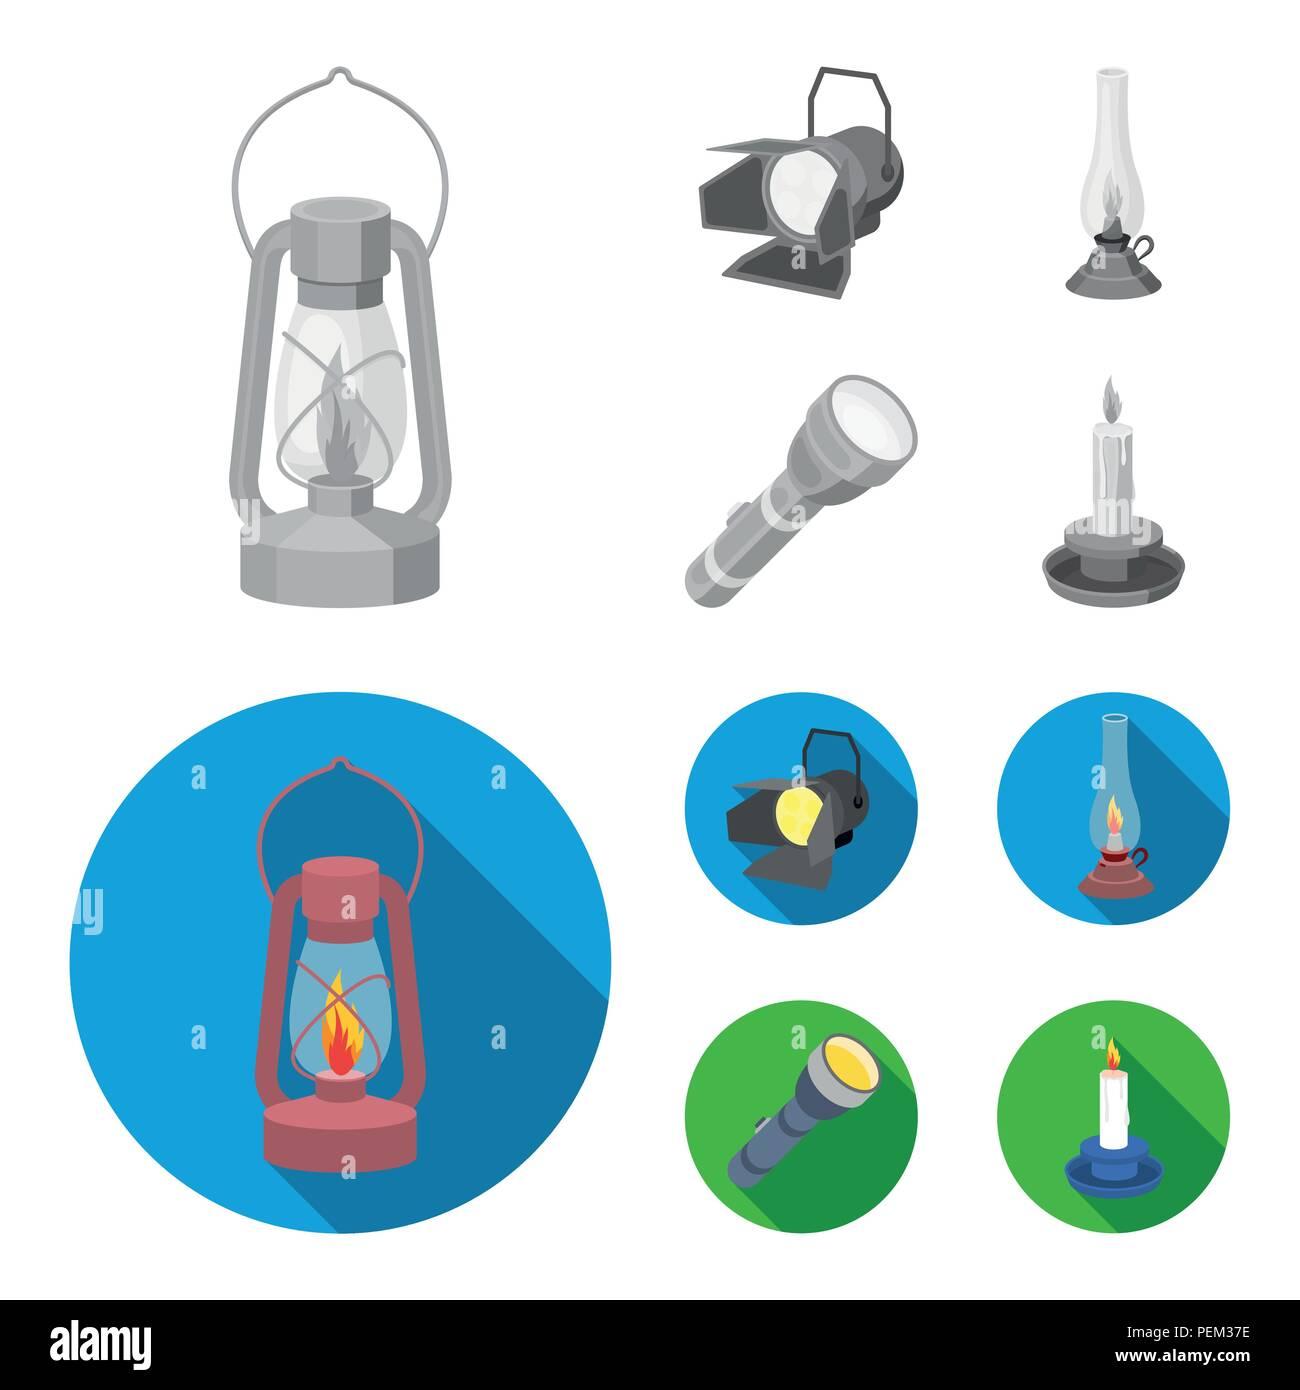 Searchlight, kerosene lamp, candle, flashlight.Light source set collection icons in monochrome,flat style vector symbol stock illustration . - Stock Image